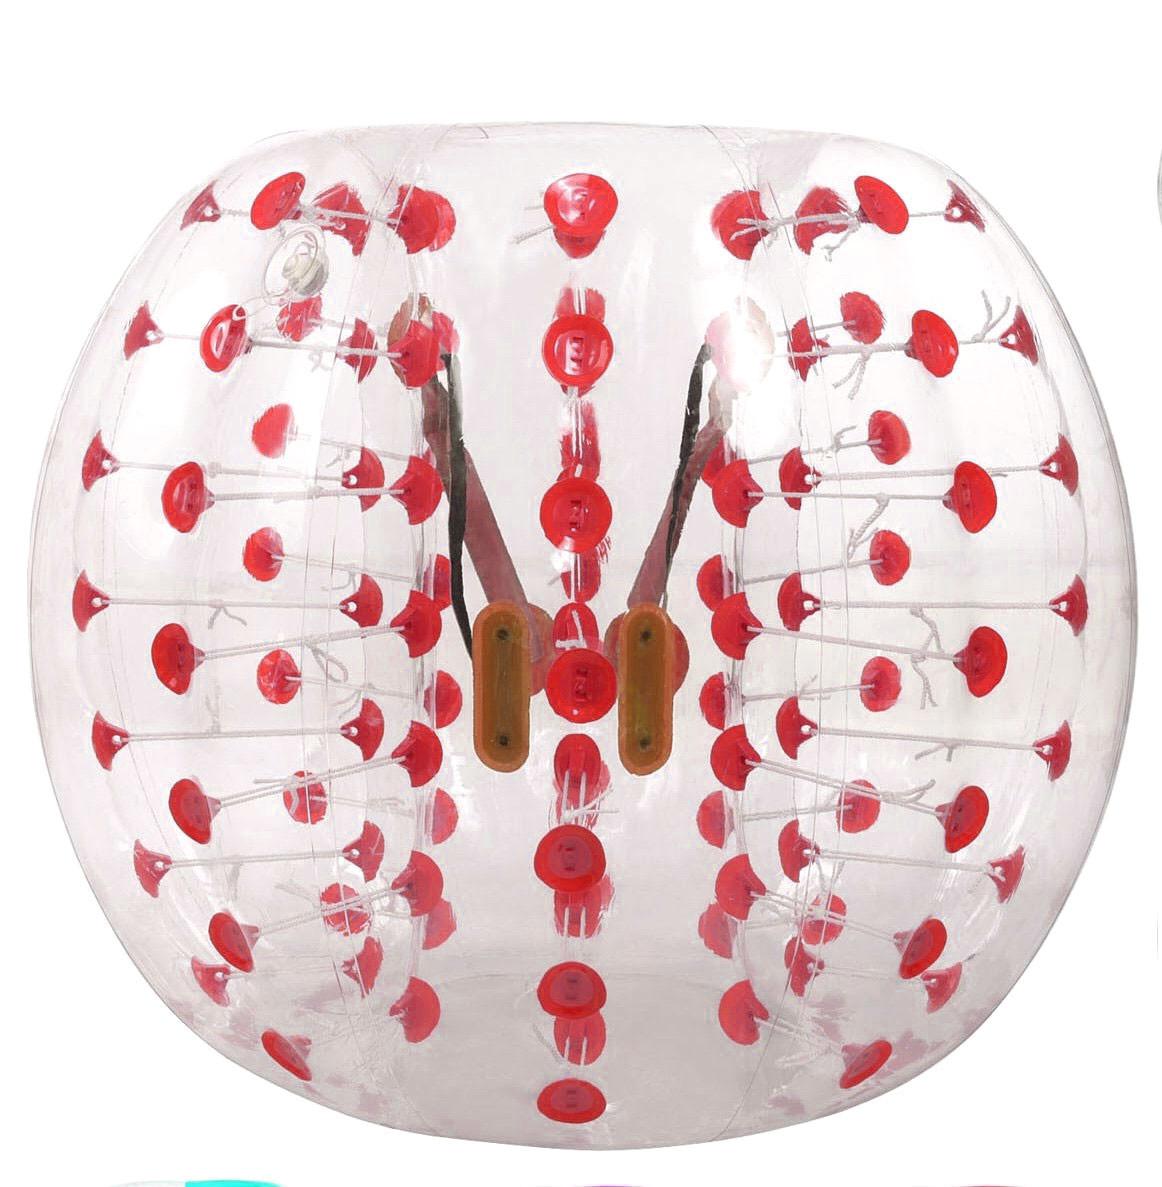 Palloni-gonfiabili-FUBUCA-da-bubble-football-150cm-in-PVC-ultra-resistente miniatura 18